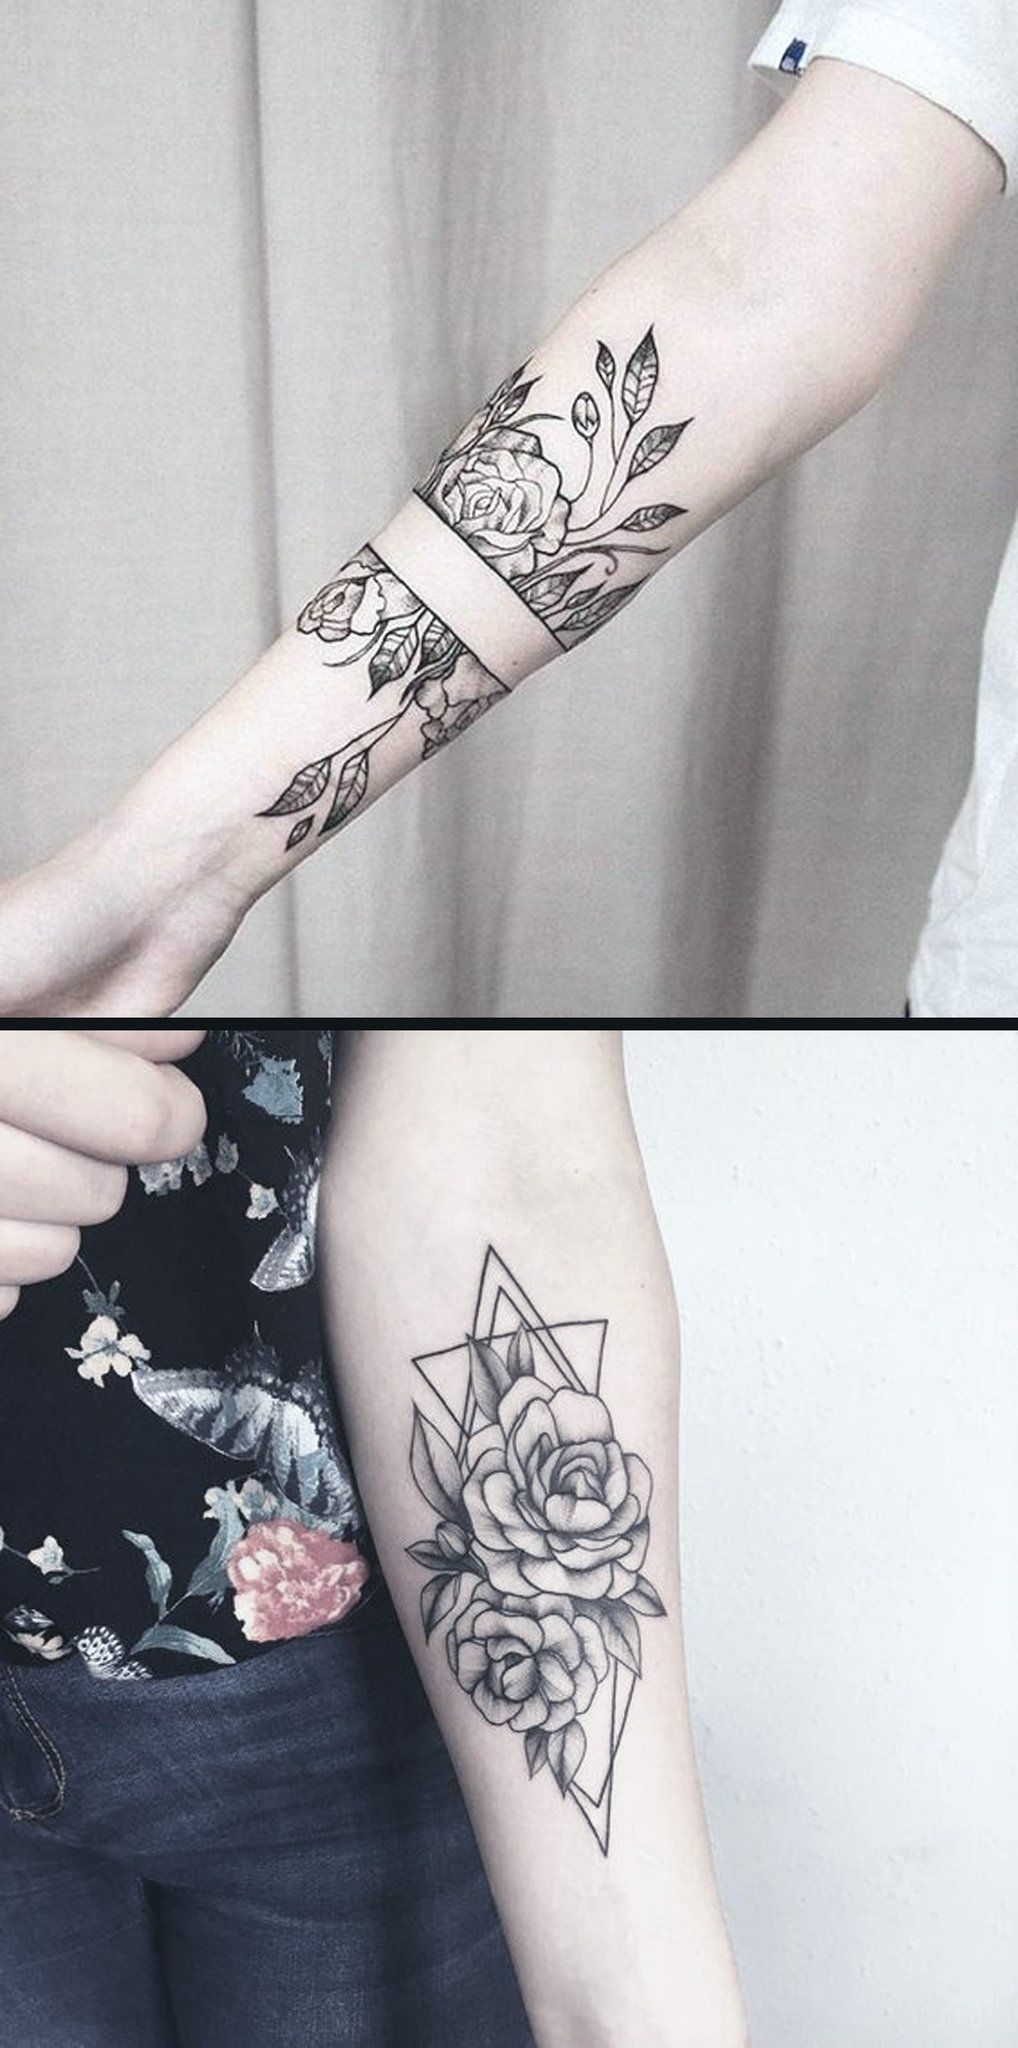 Geometric Diamond Rose Forearm Tattoo Ideas for Women